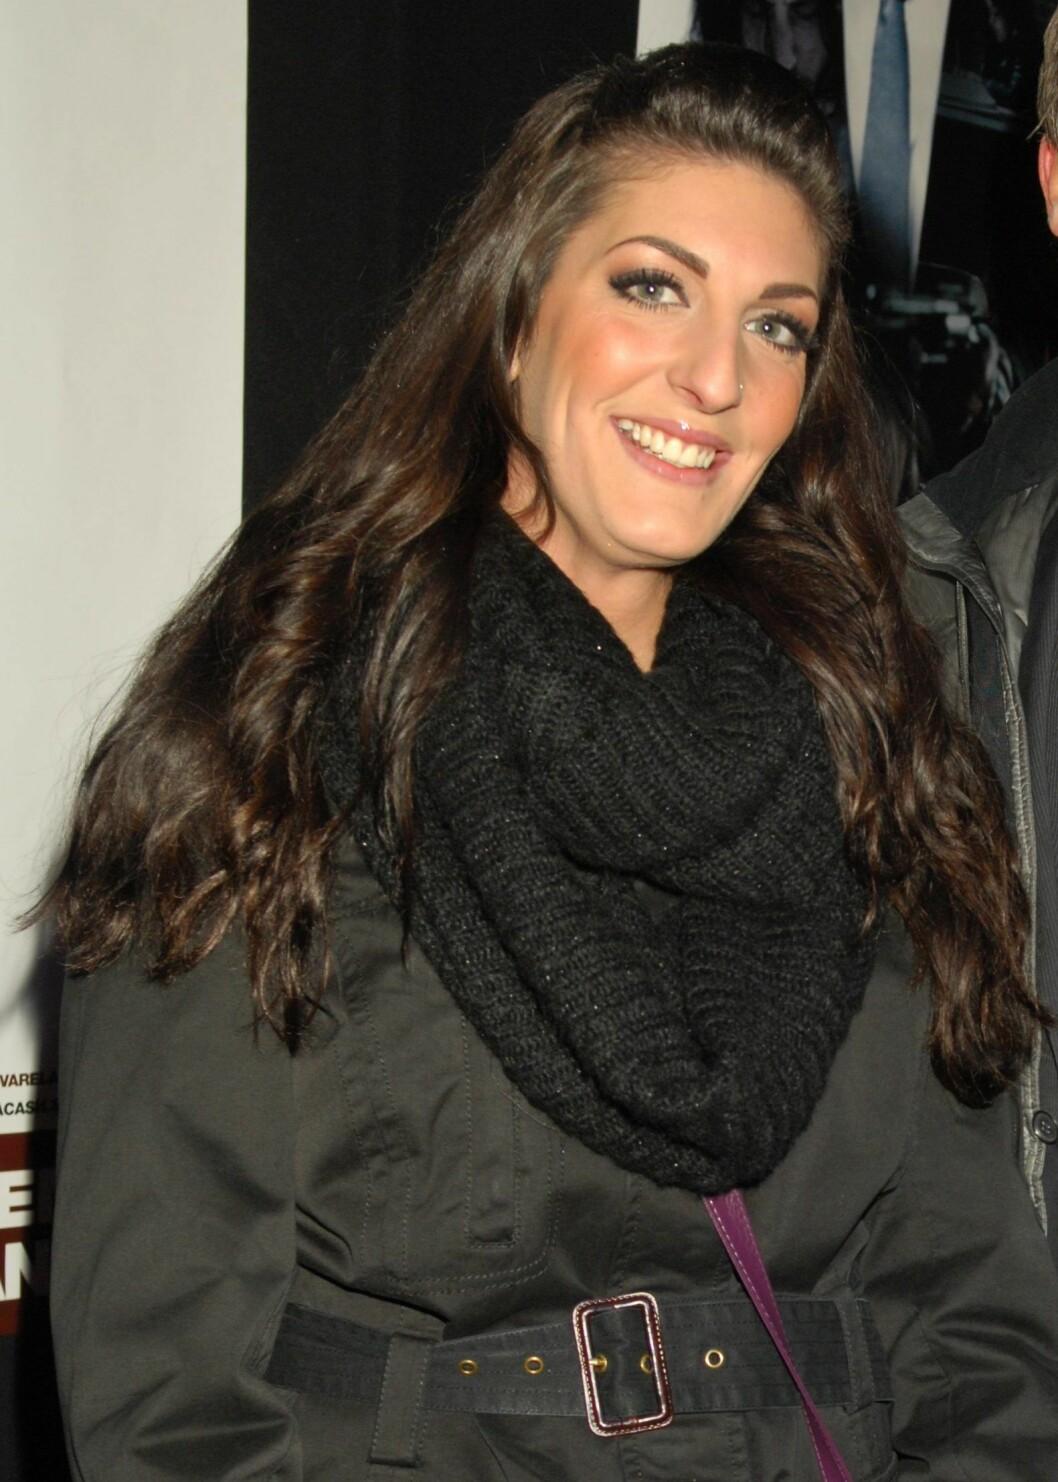 Soraya Lavasani